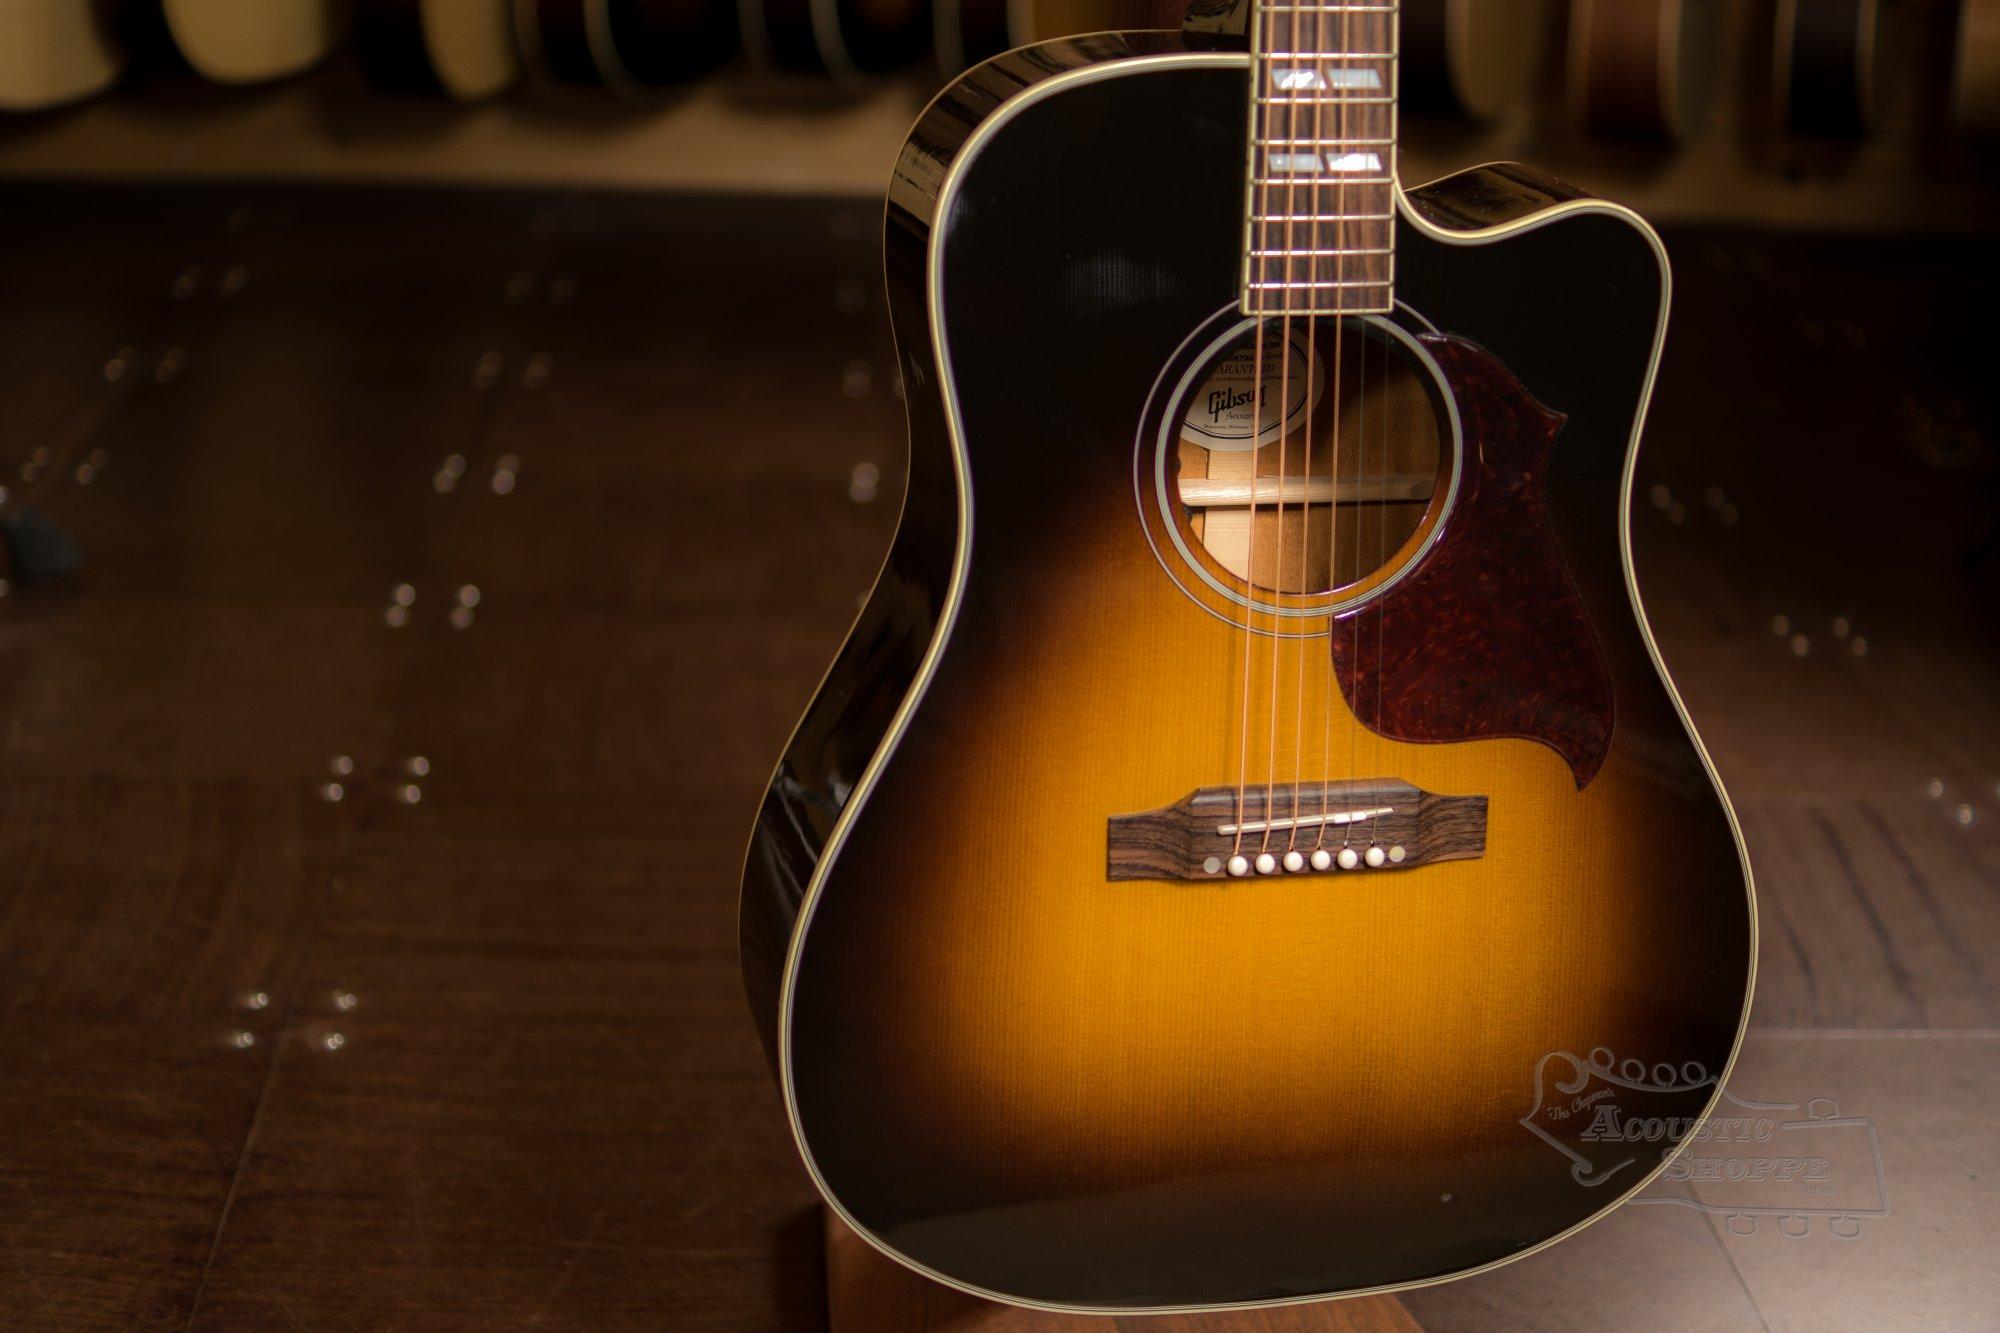 Gibson Hummingbird Pro (Used)